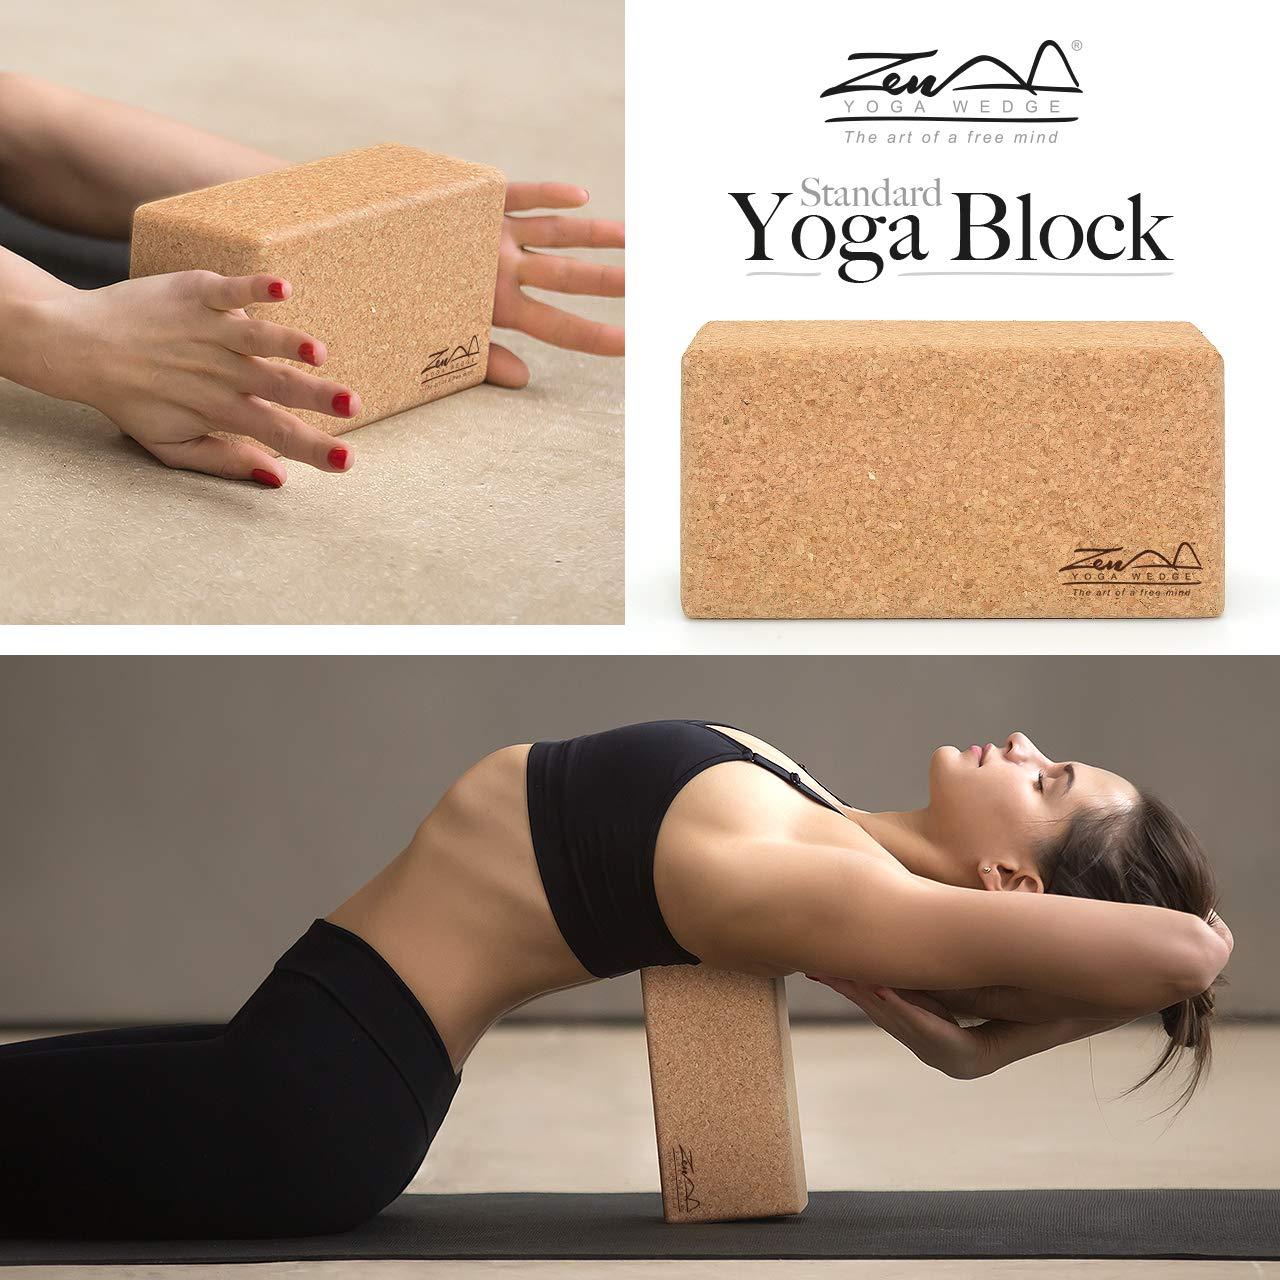 ZenYogaWedge - Juego de 2 Bloques de Yoga de Corcho estándar ...